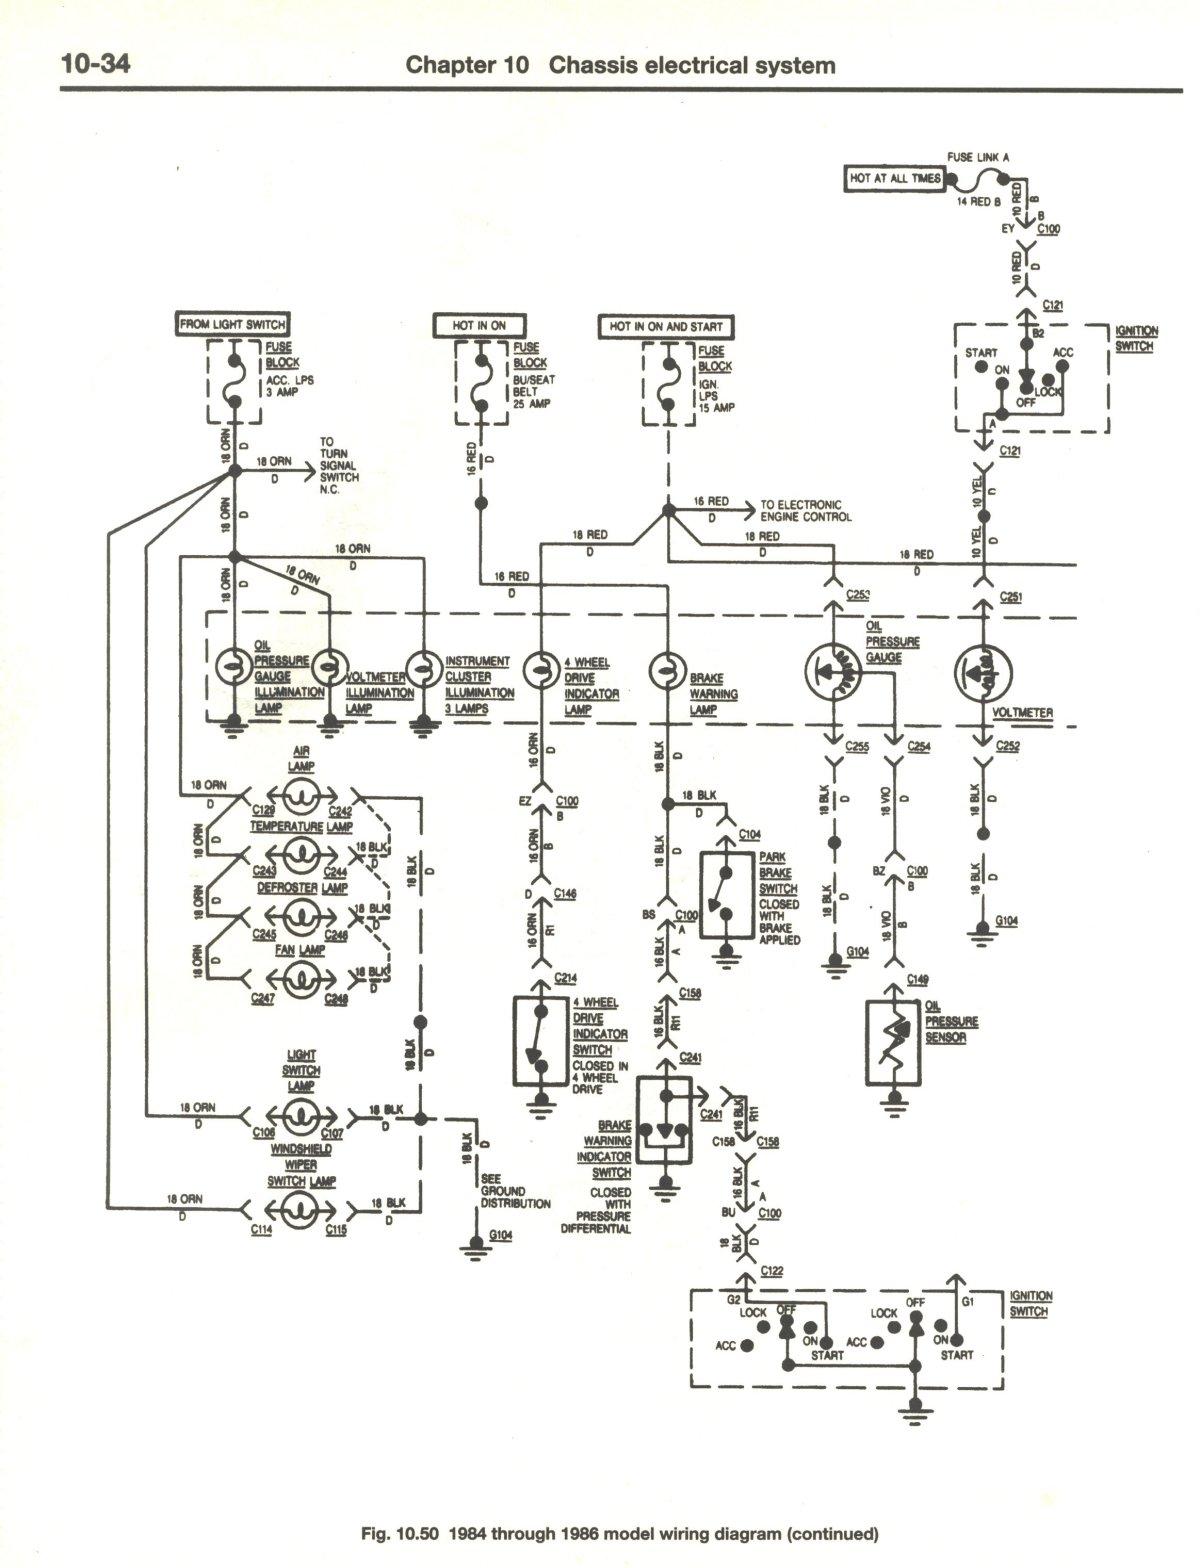 jeep cj7 wiring diagram case 446 tractor cj light library